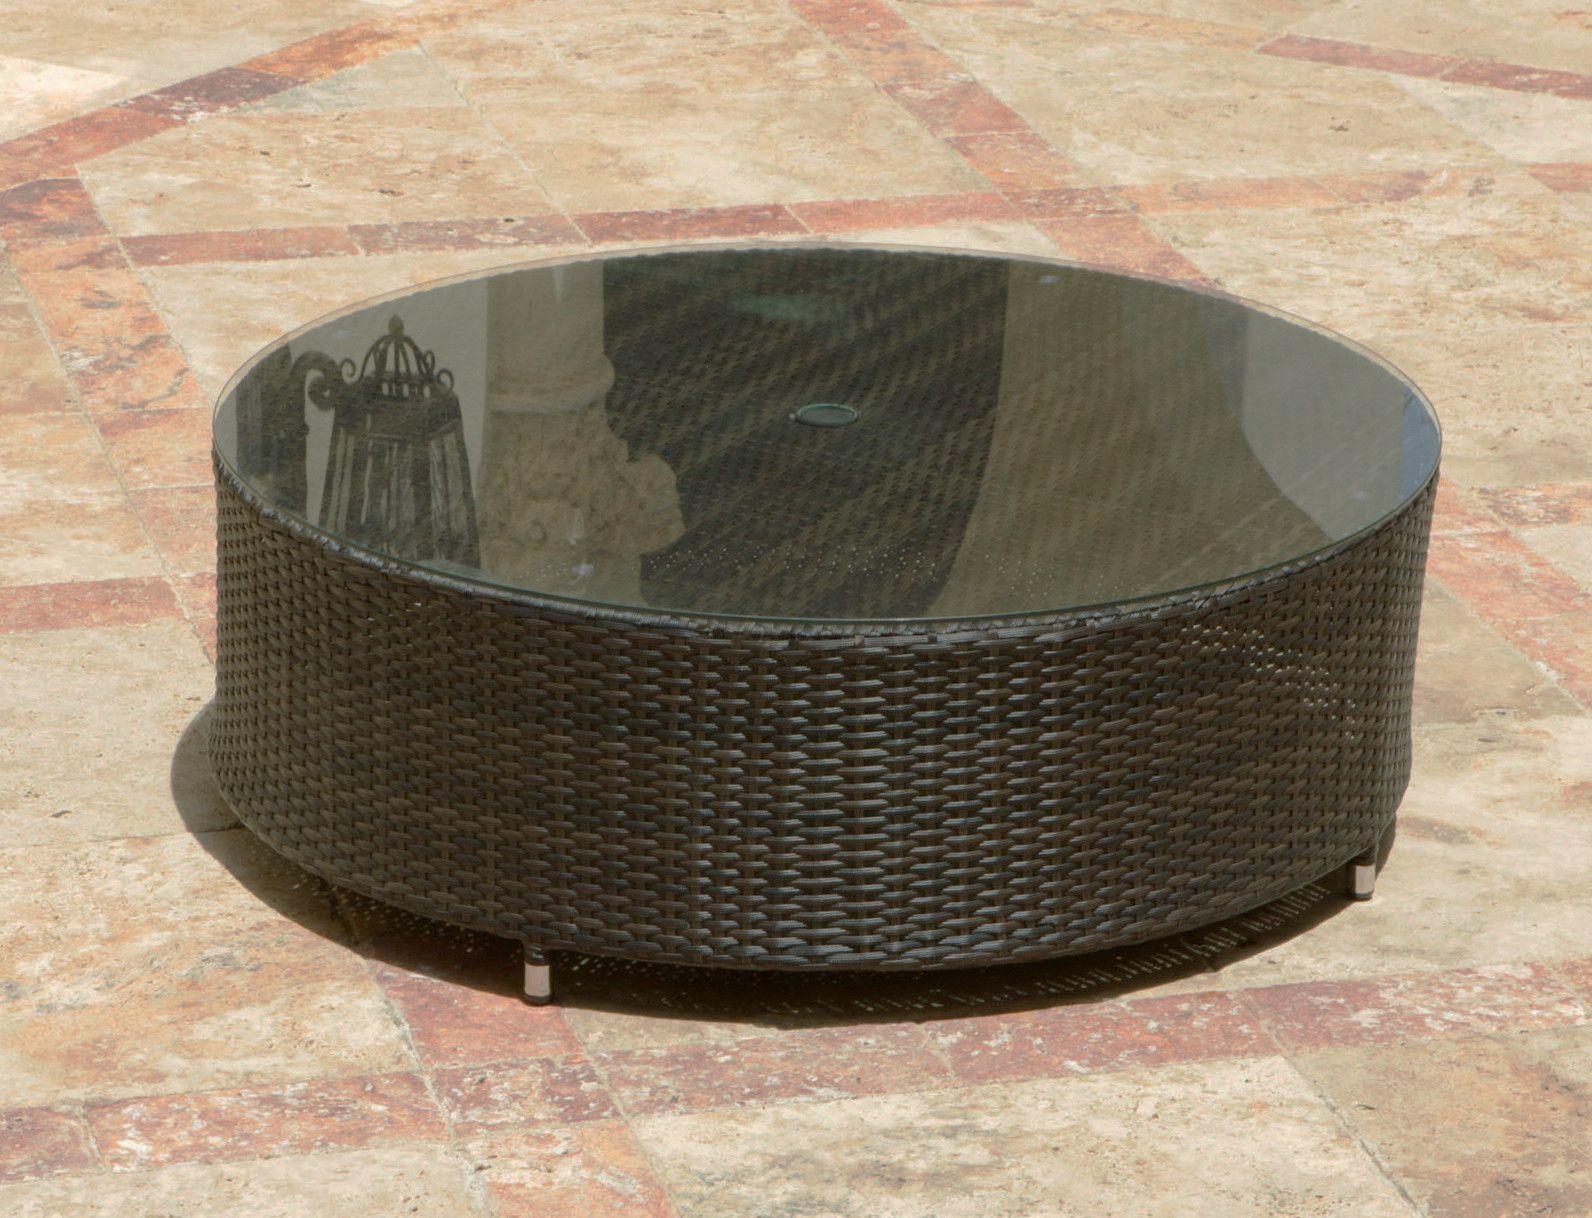 Source Outdoor Circa Round Coffee Table With Umbrella Hole Pergolas [ jpg ]